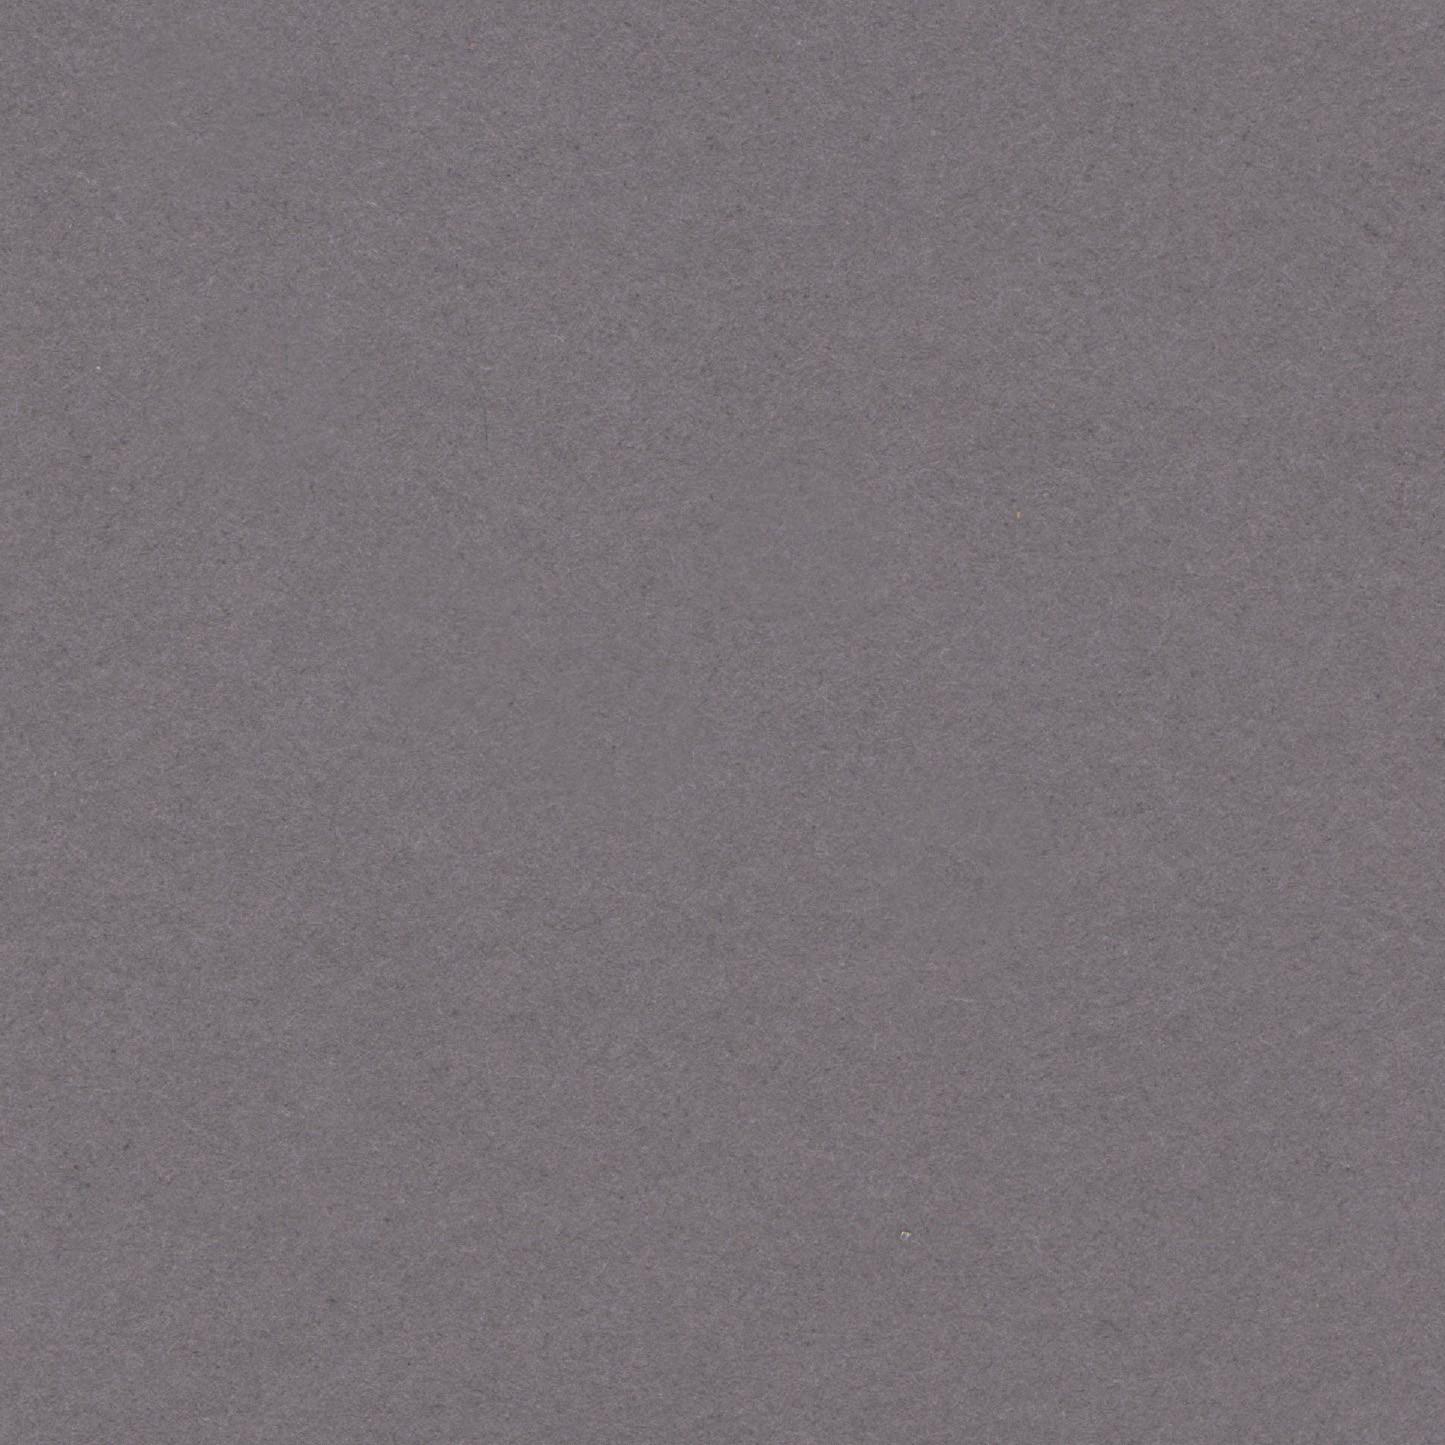 Grey - Urban 150gsm